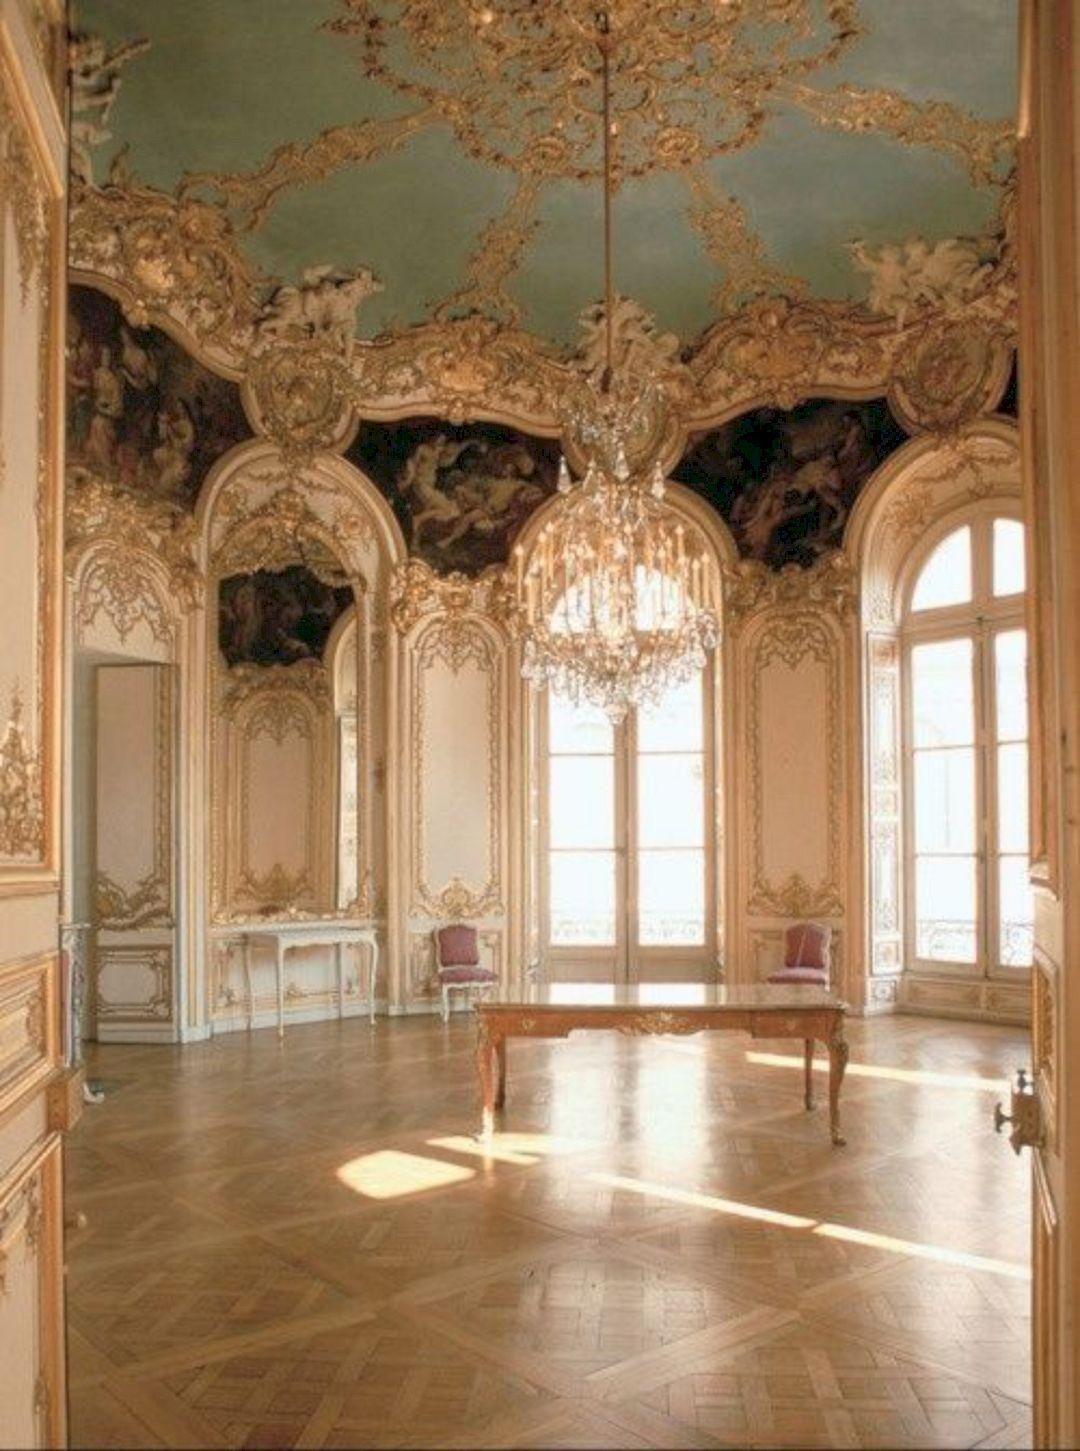 15 Interior Design Ideas For A Victorian Themed Home Victorian